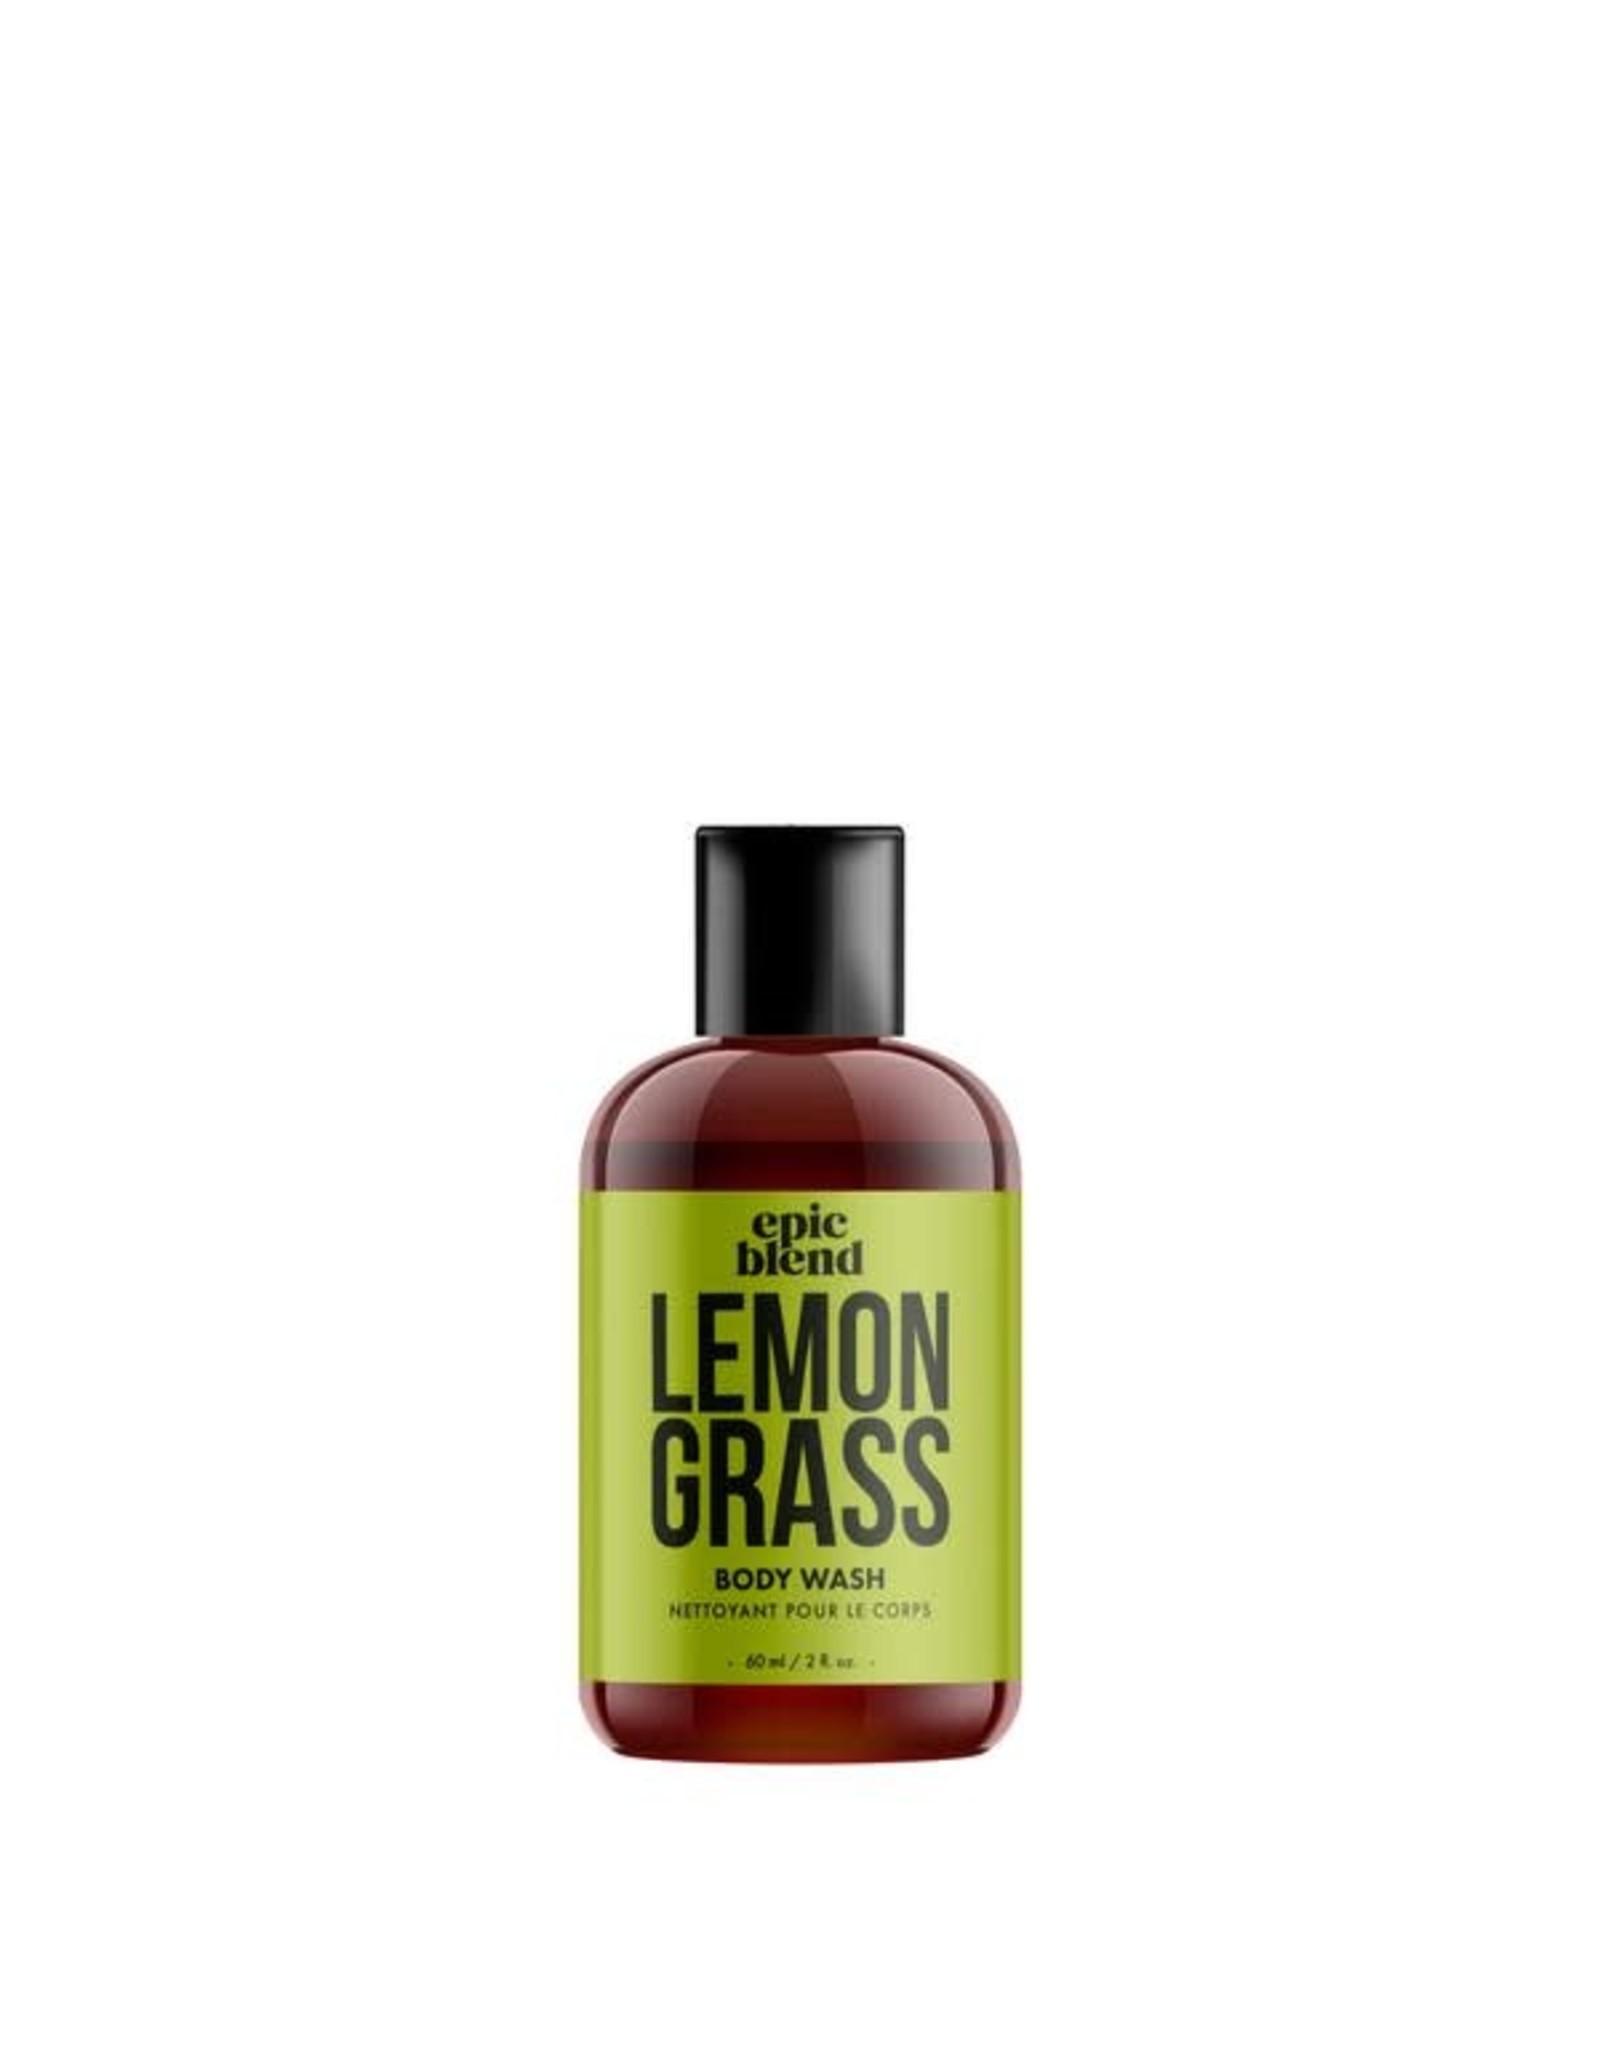 Epic Blend Lemongrass Body Wash